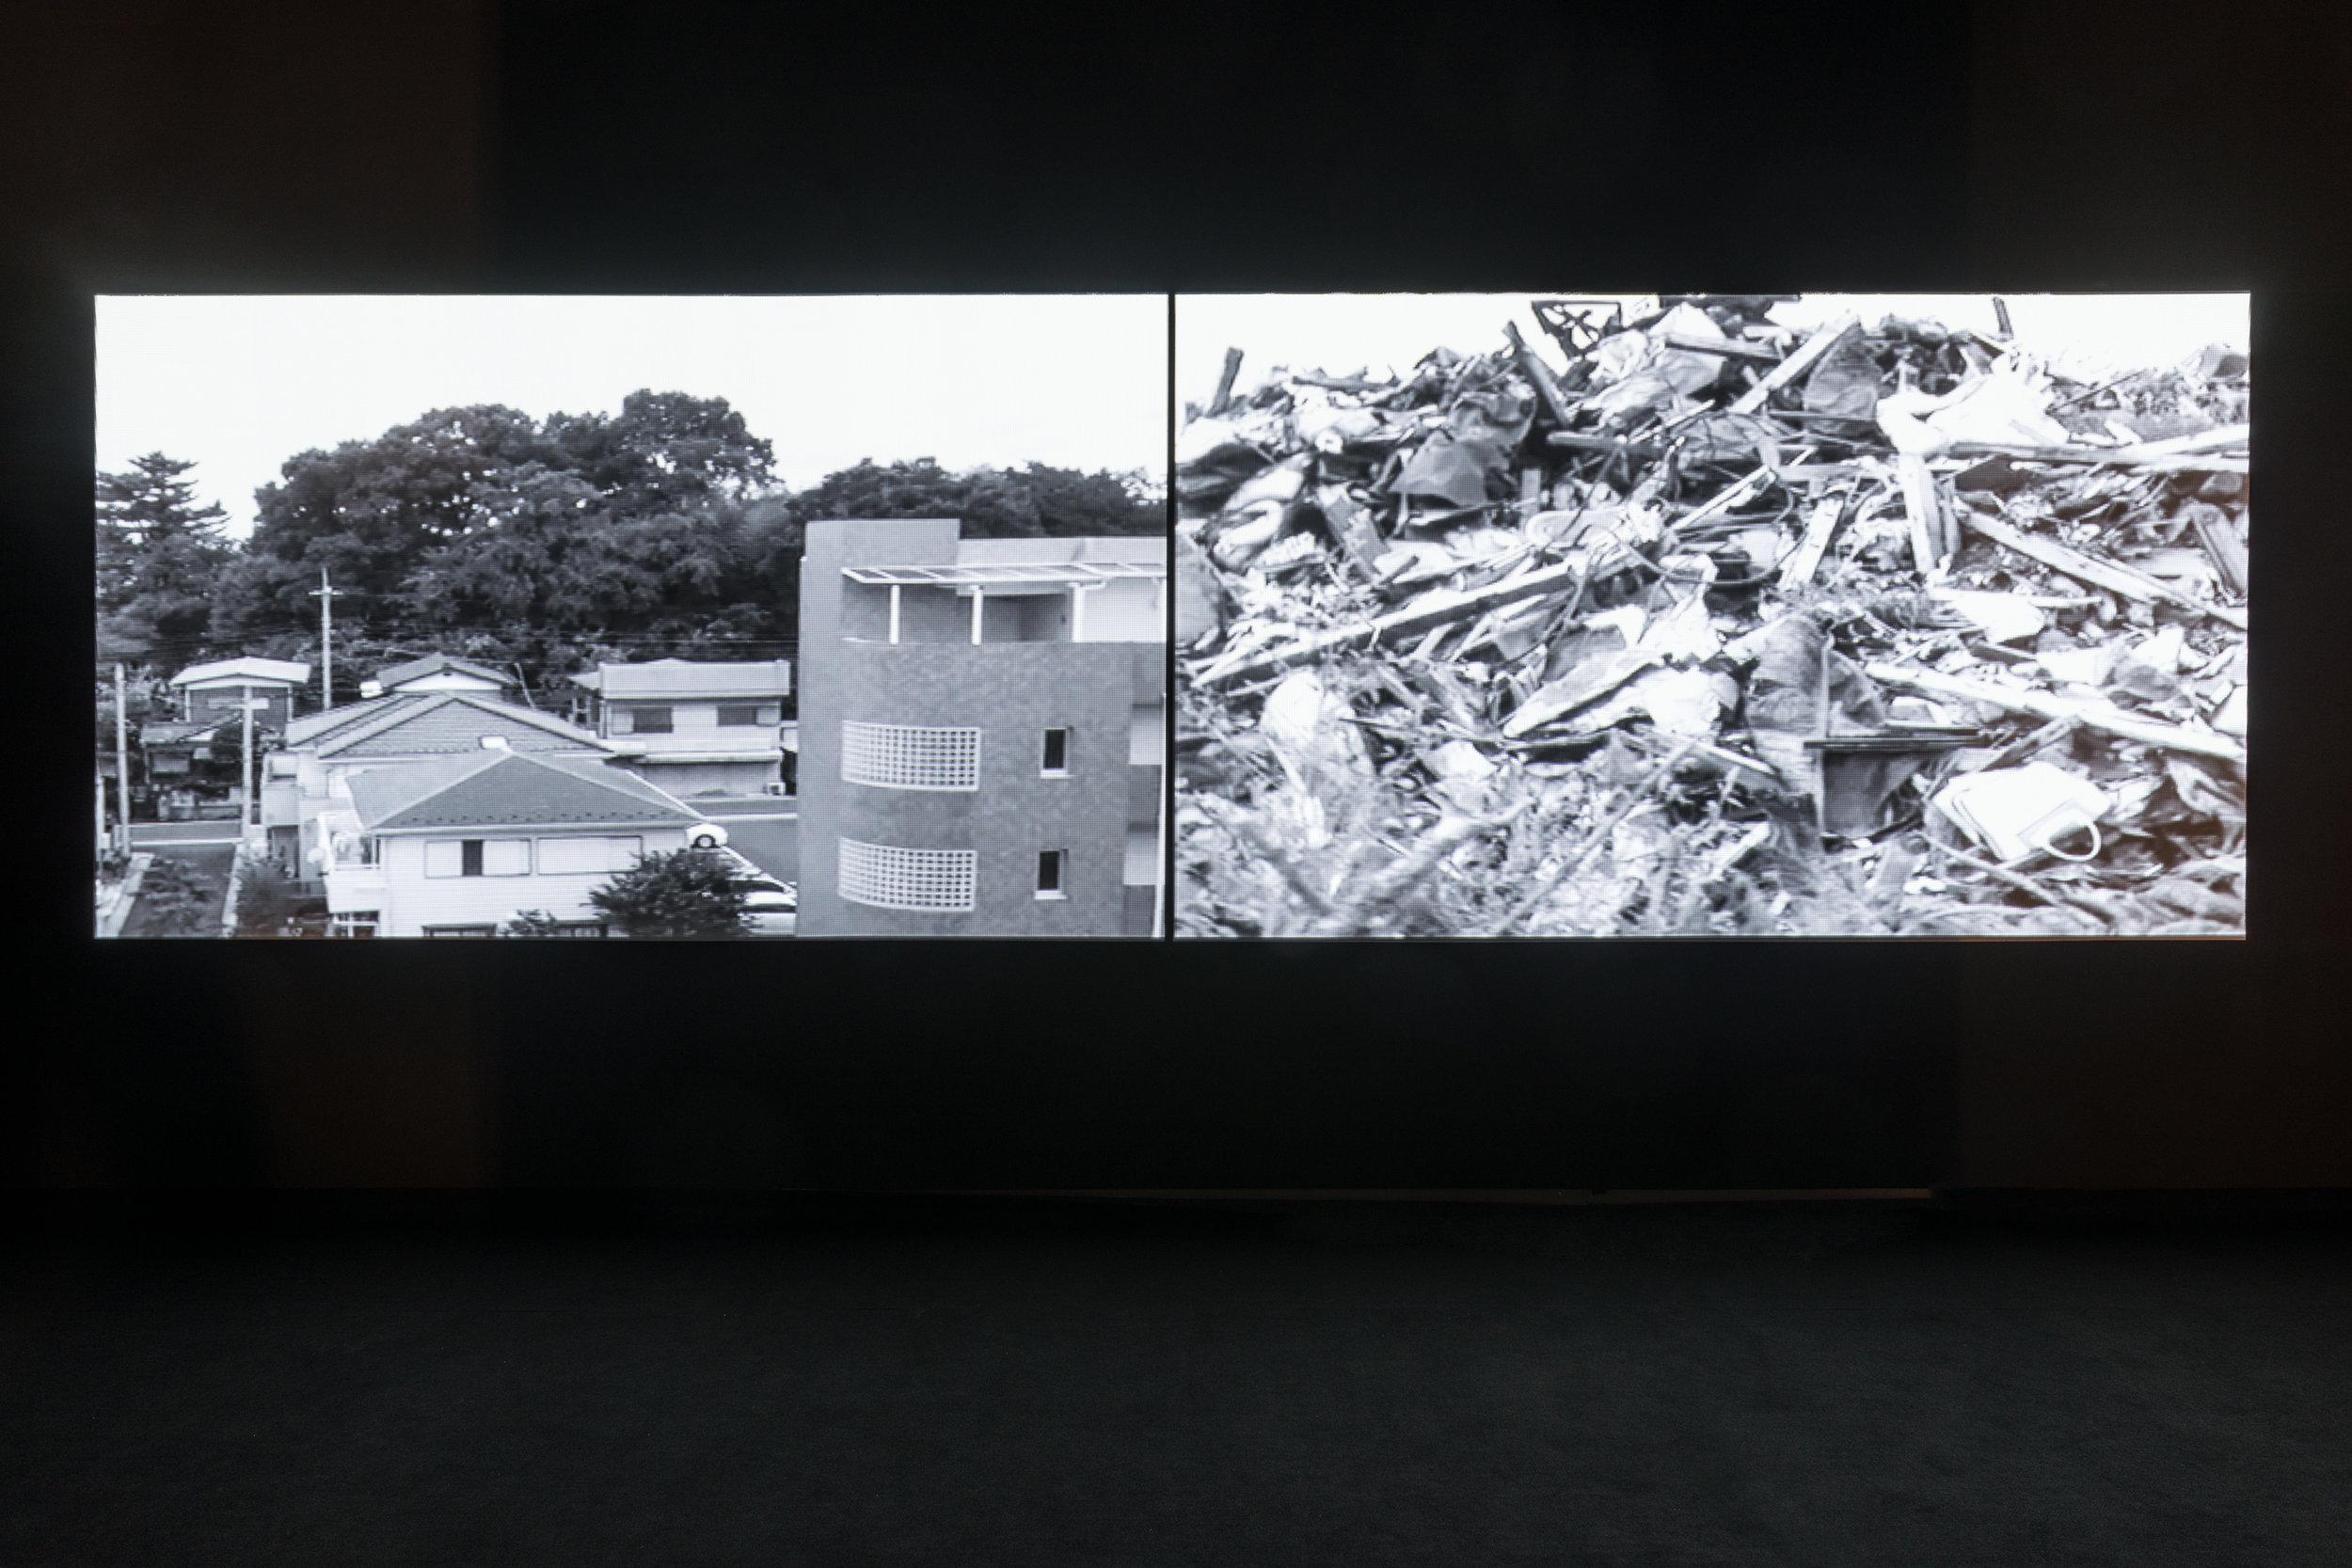 Welcome to Fukushima, 2013.